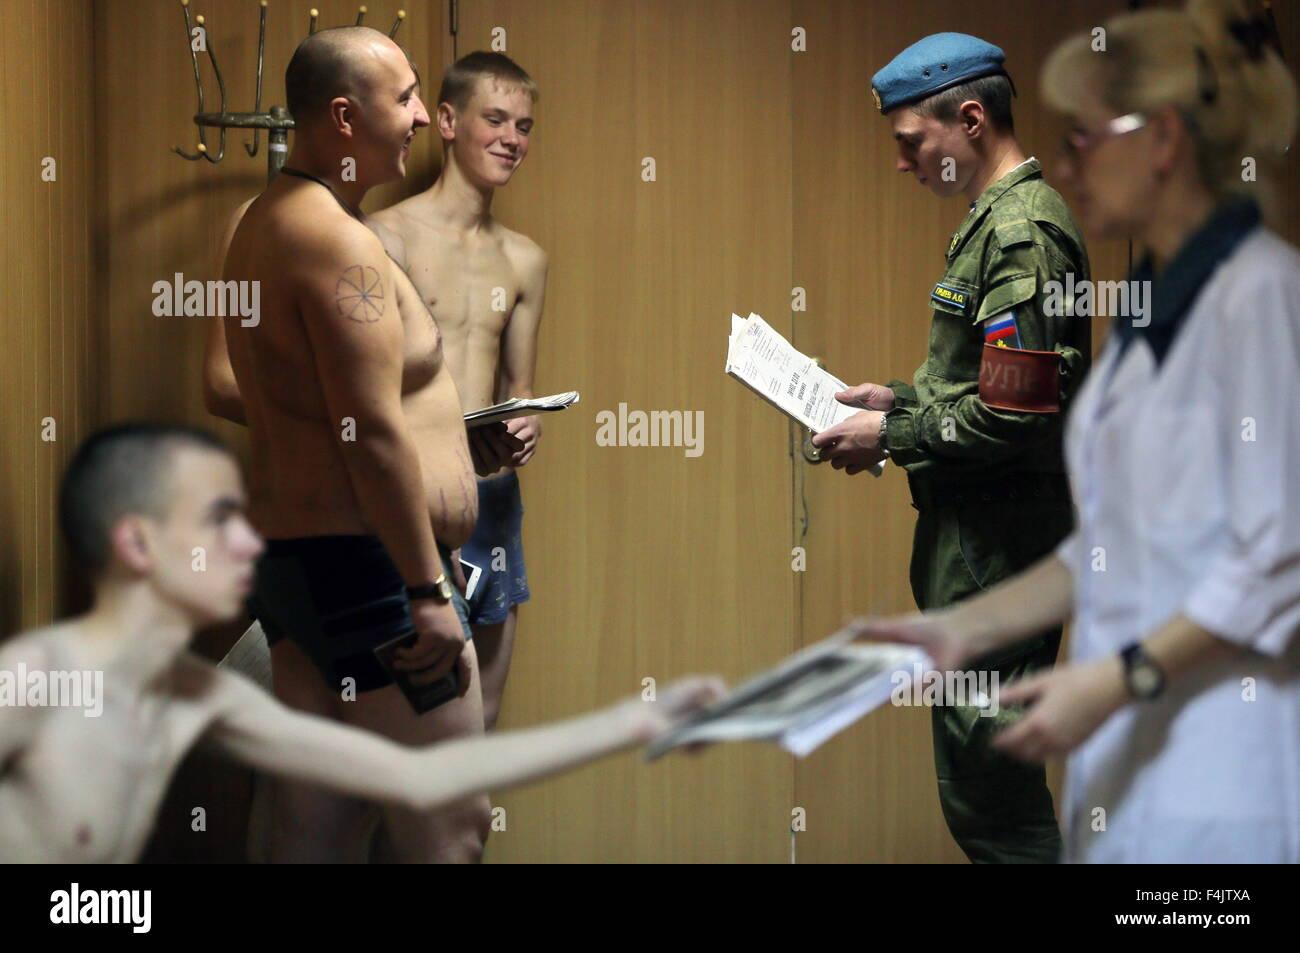 image Military medical exam and gay roman